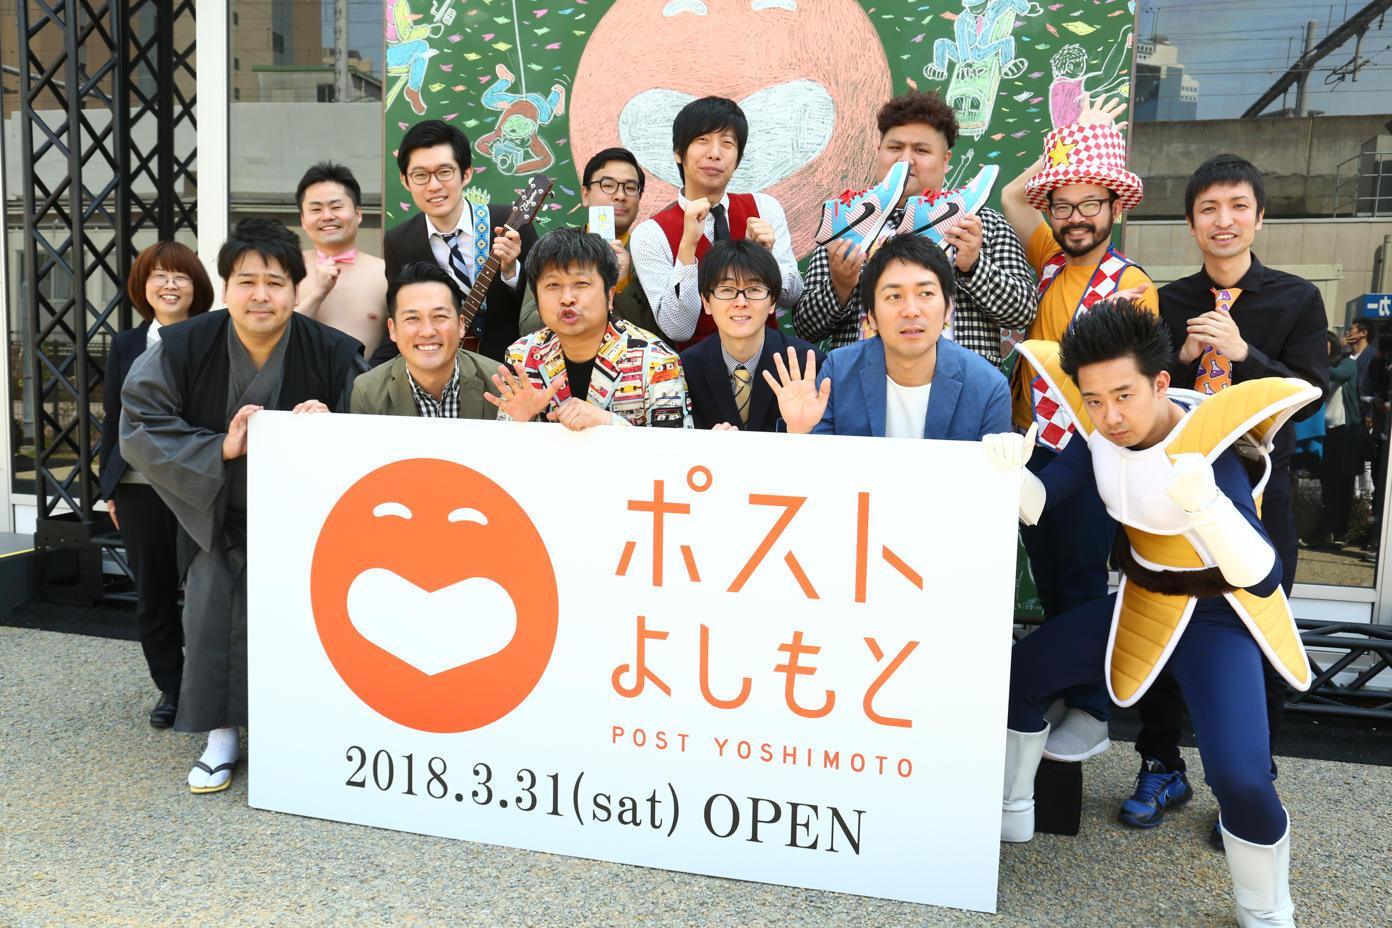 http://news.yoshimoto.co.jp/20180329150708-4e7eeb2c1169f5878353fa3883ebce7814a69043.jpg